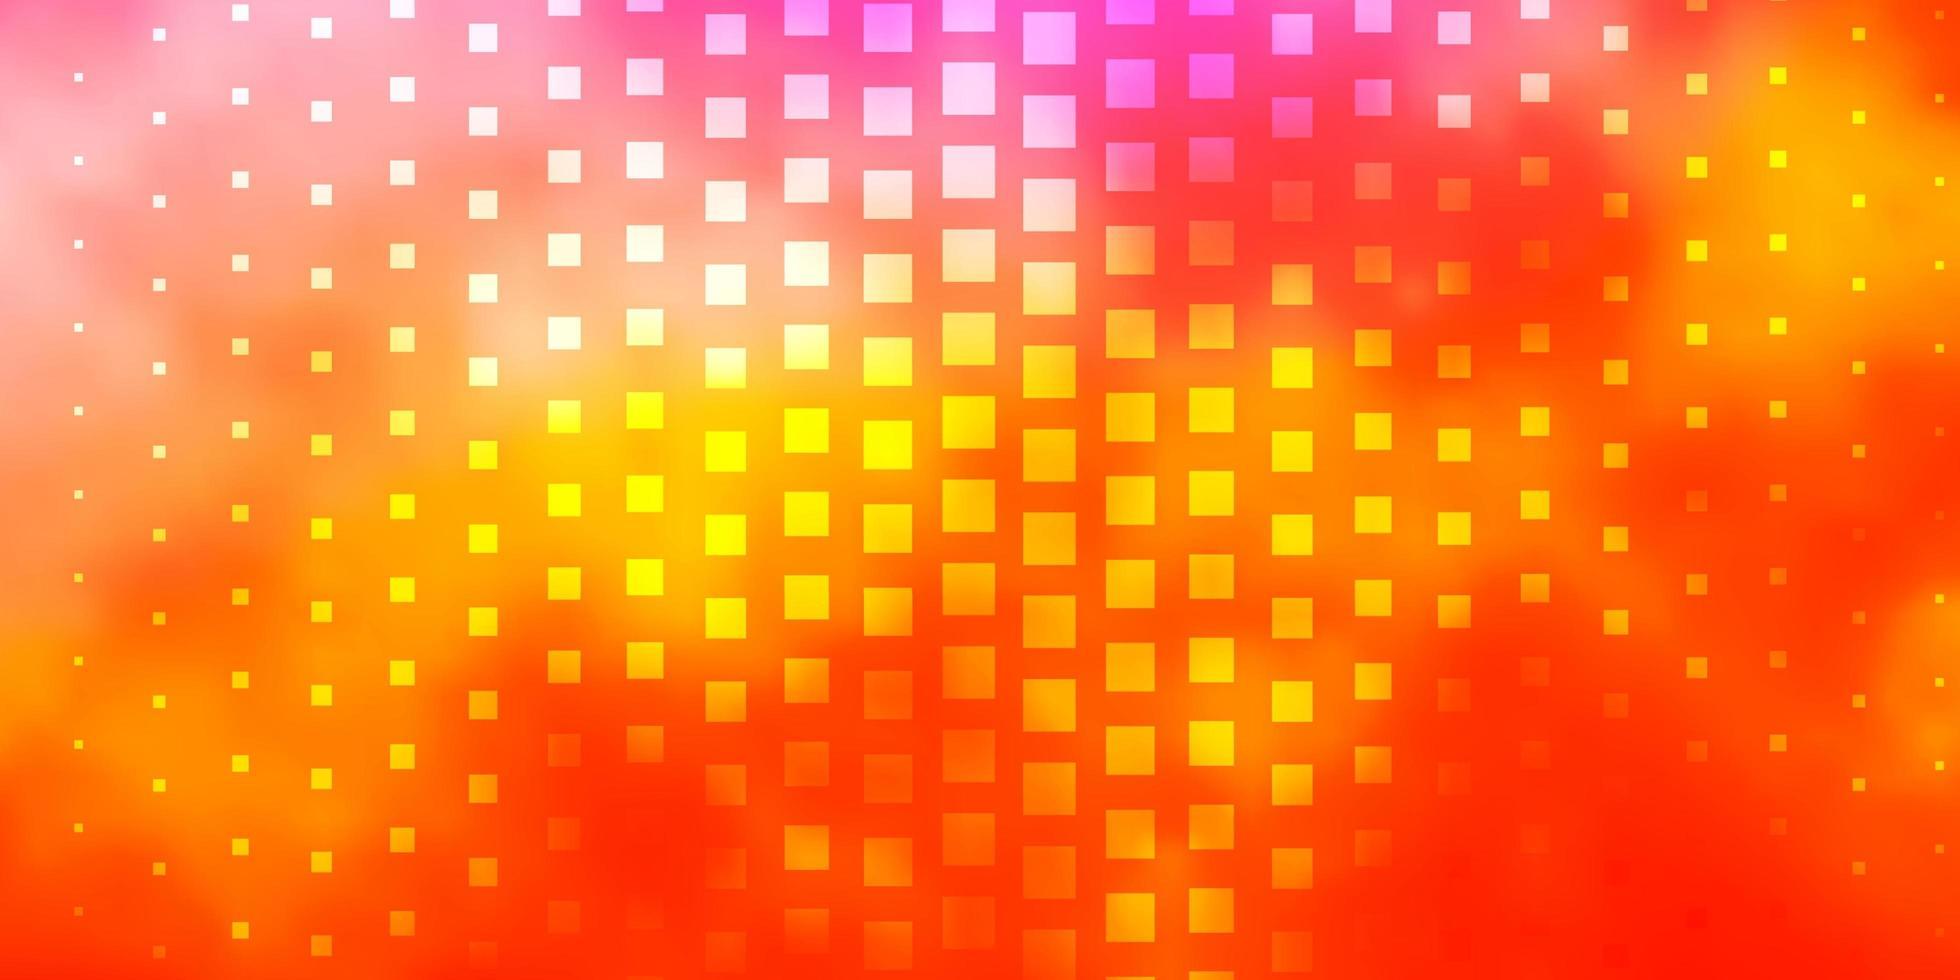 gul bakgrund med rektanglar. vektor